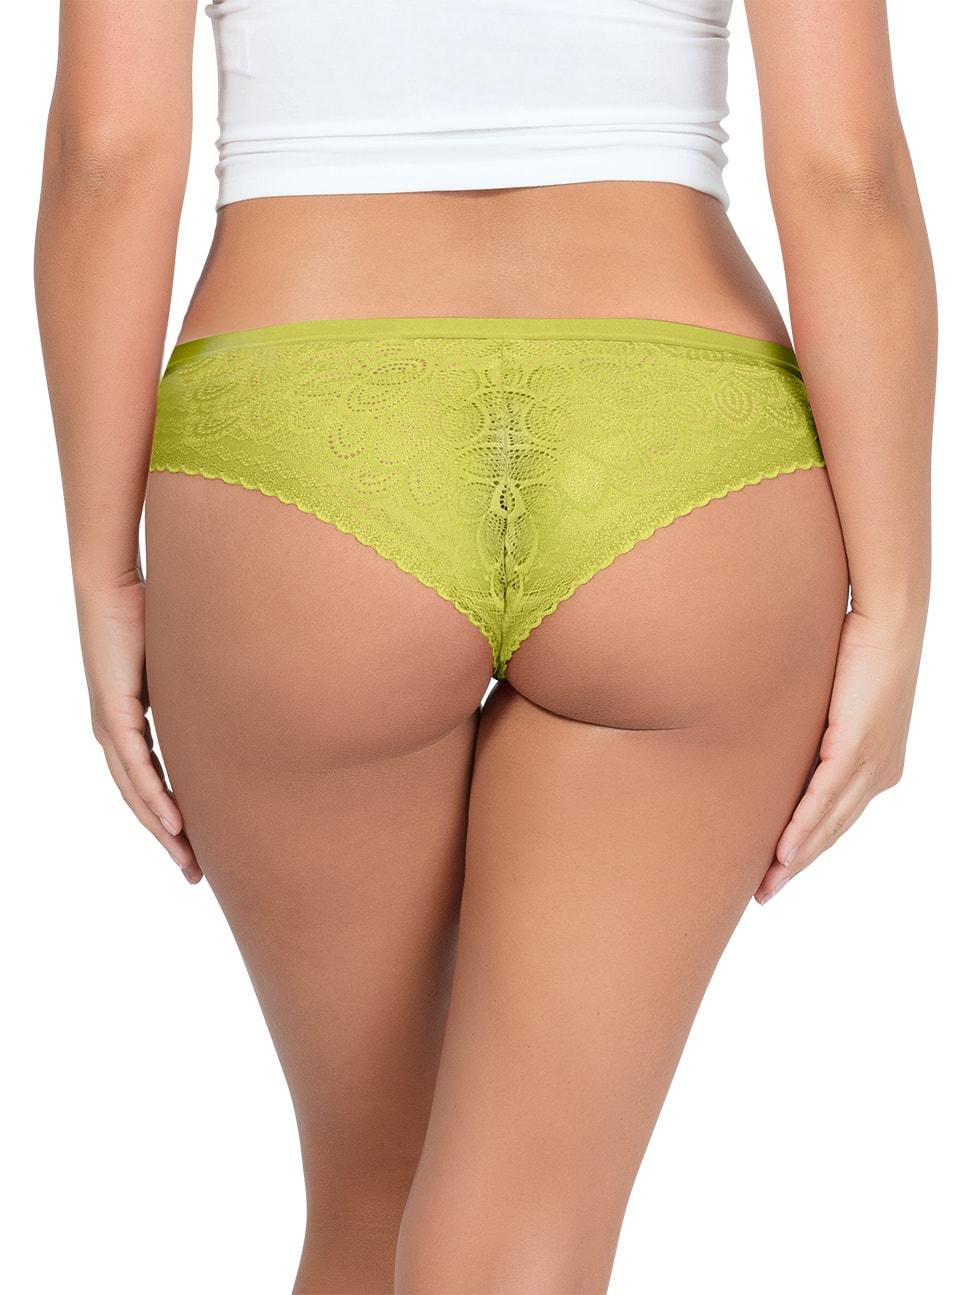 PARFAIT ParfaitPanty SoGlam BikiniPP302 Lemonade Back2 copy - Parfait Panty So Glam Bikini - Lemonade - PP302